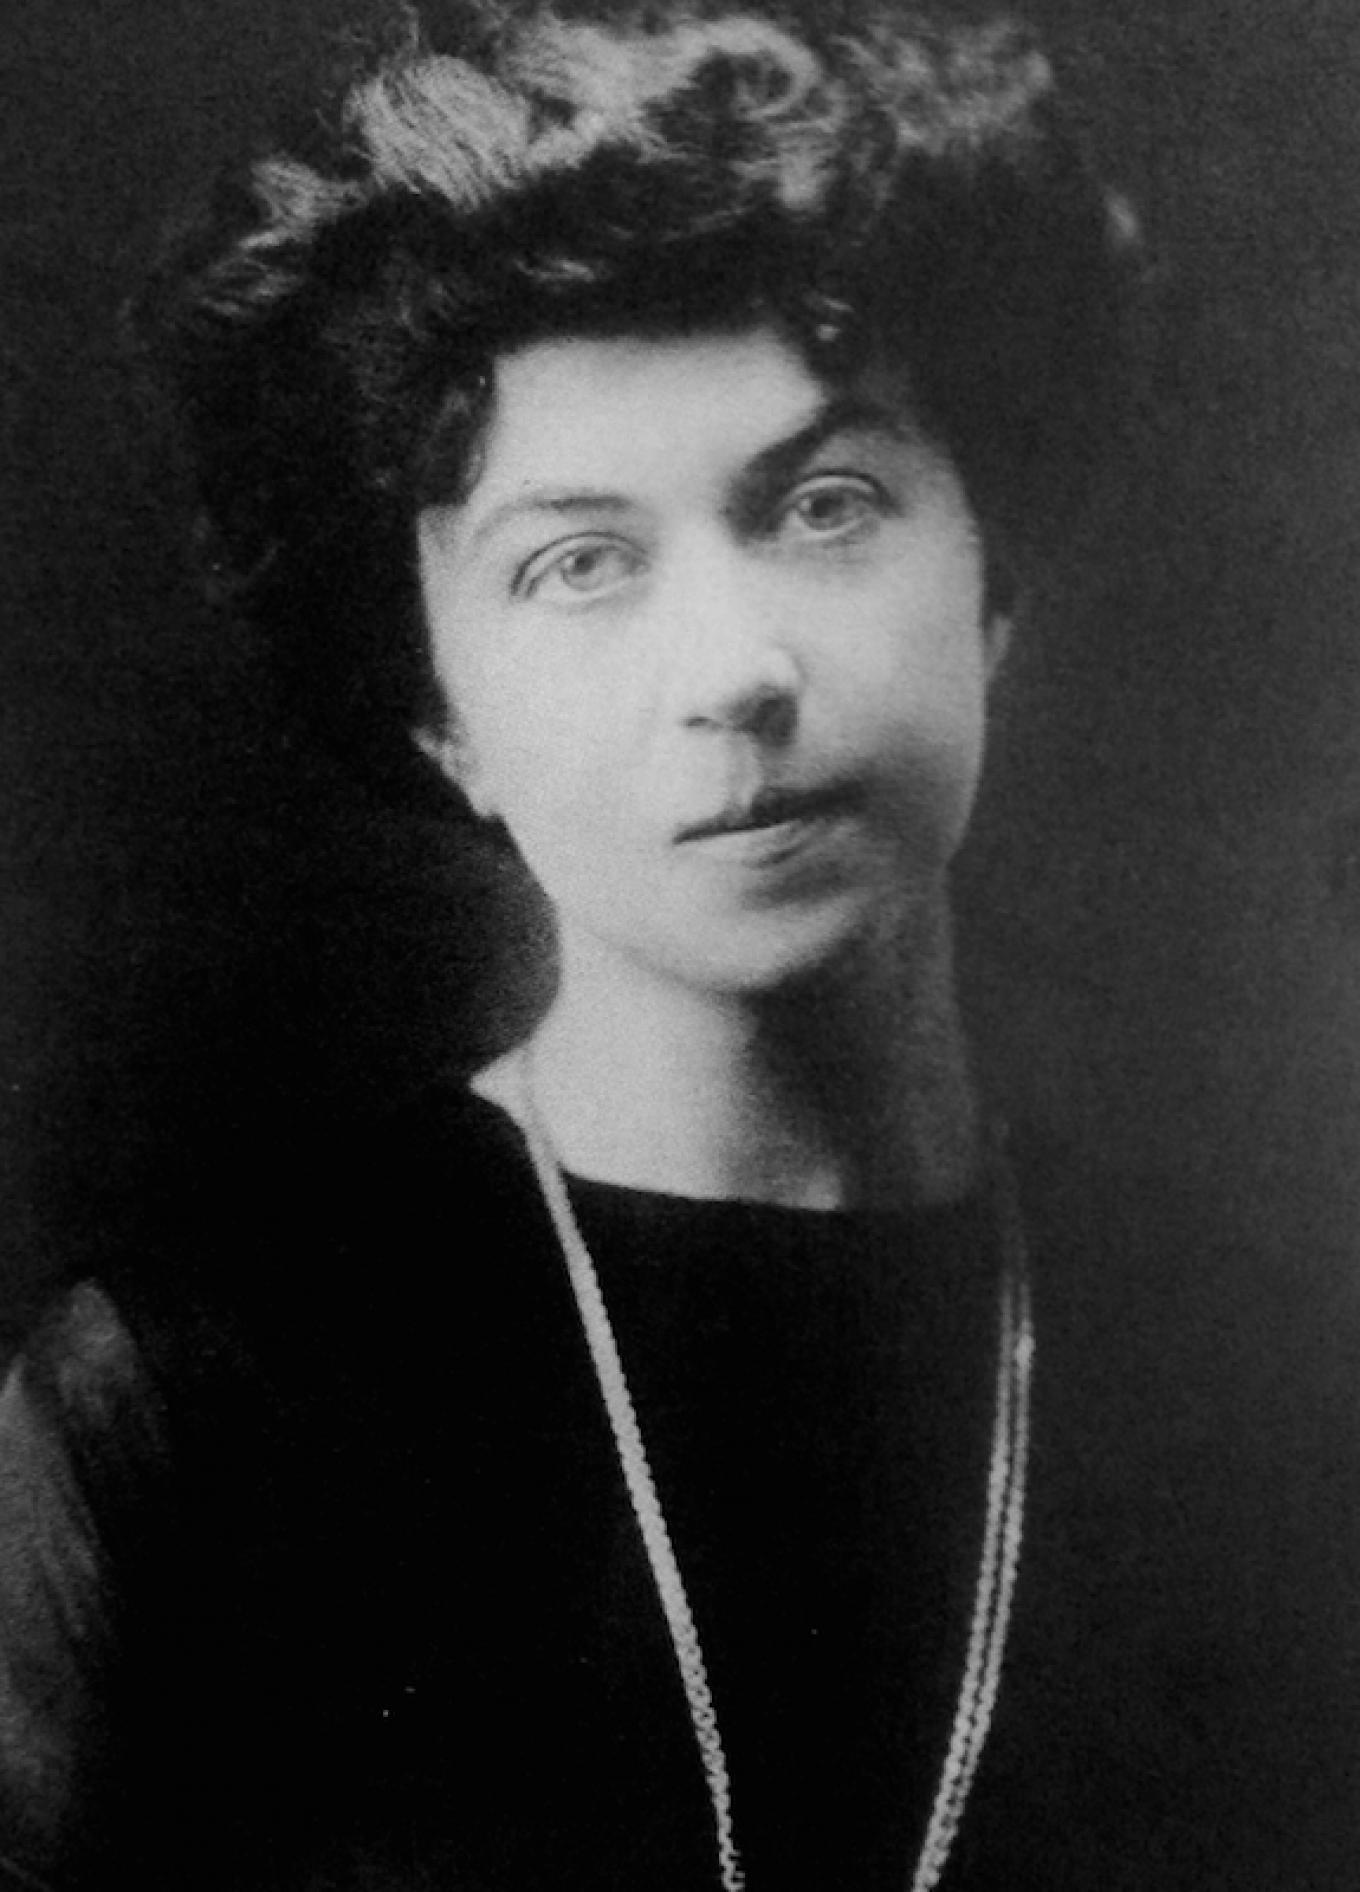 Alexandra Kollontai Project1917